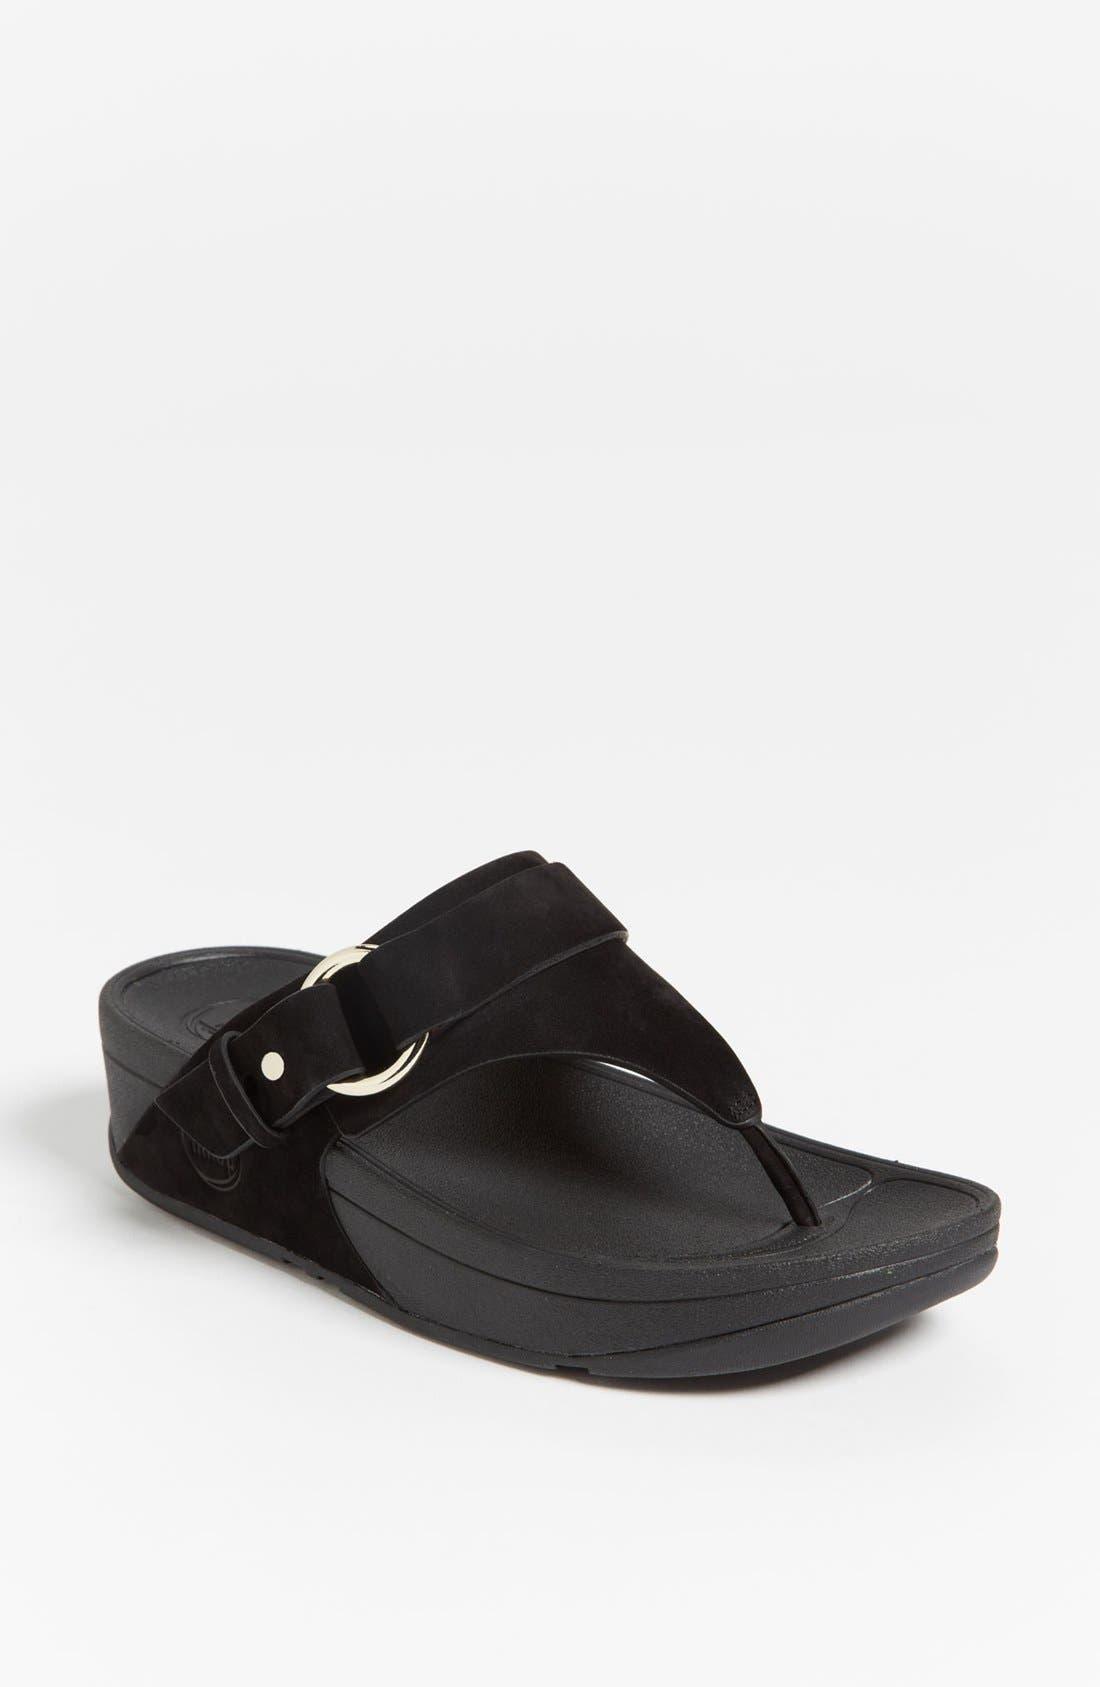 Main Image - FitFlop 'Via™' Nubuck Sandal